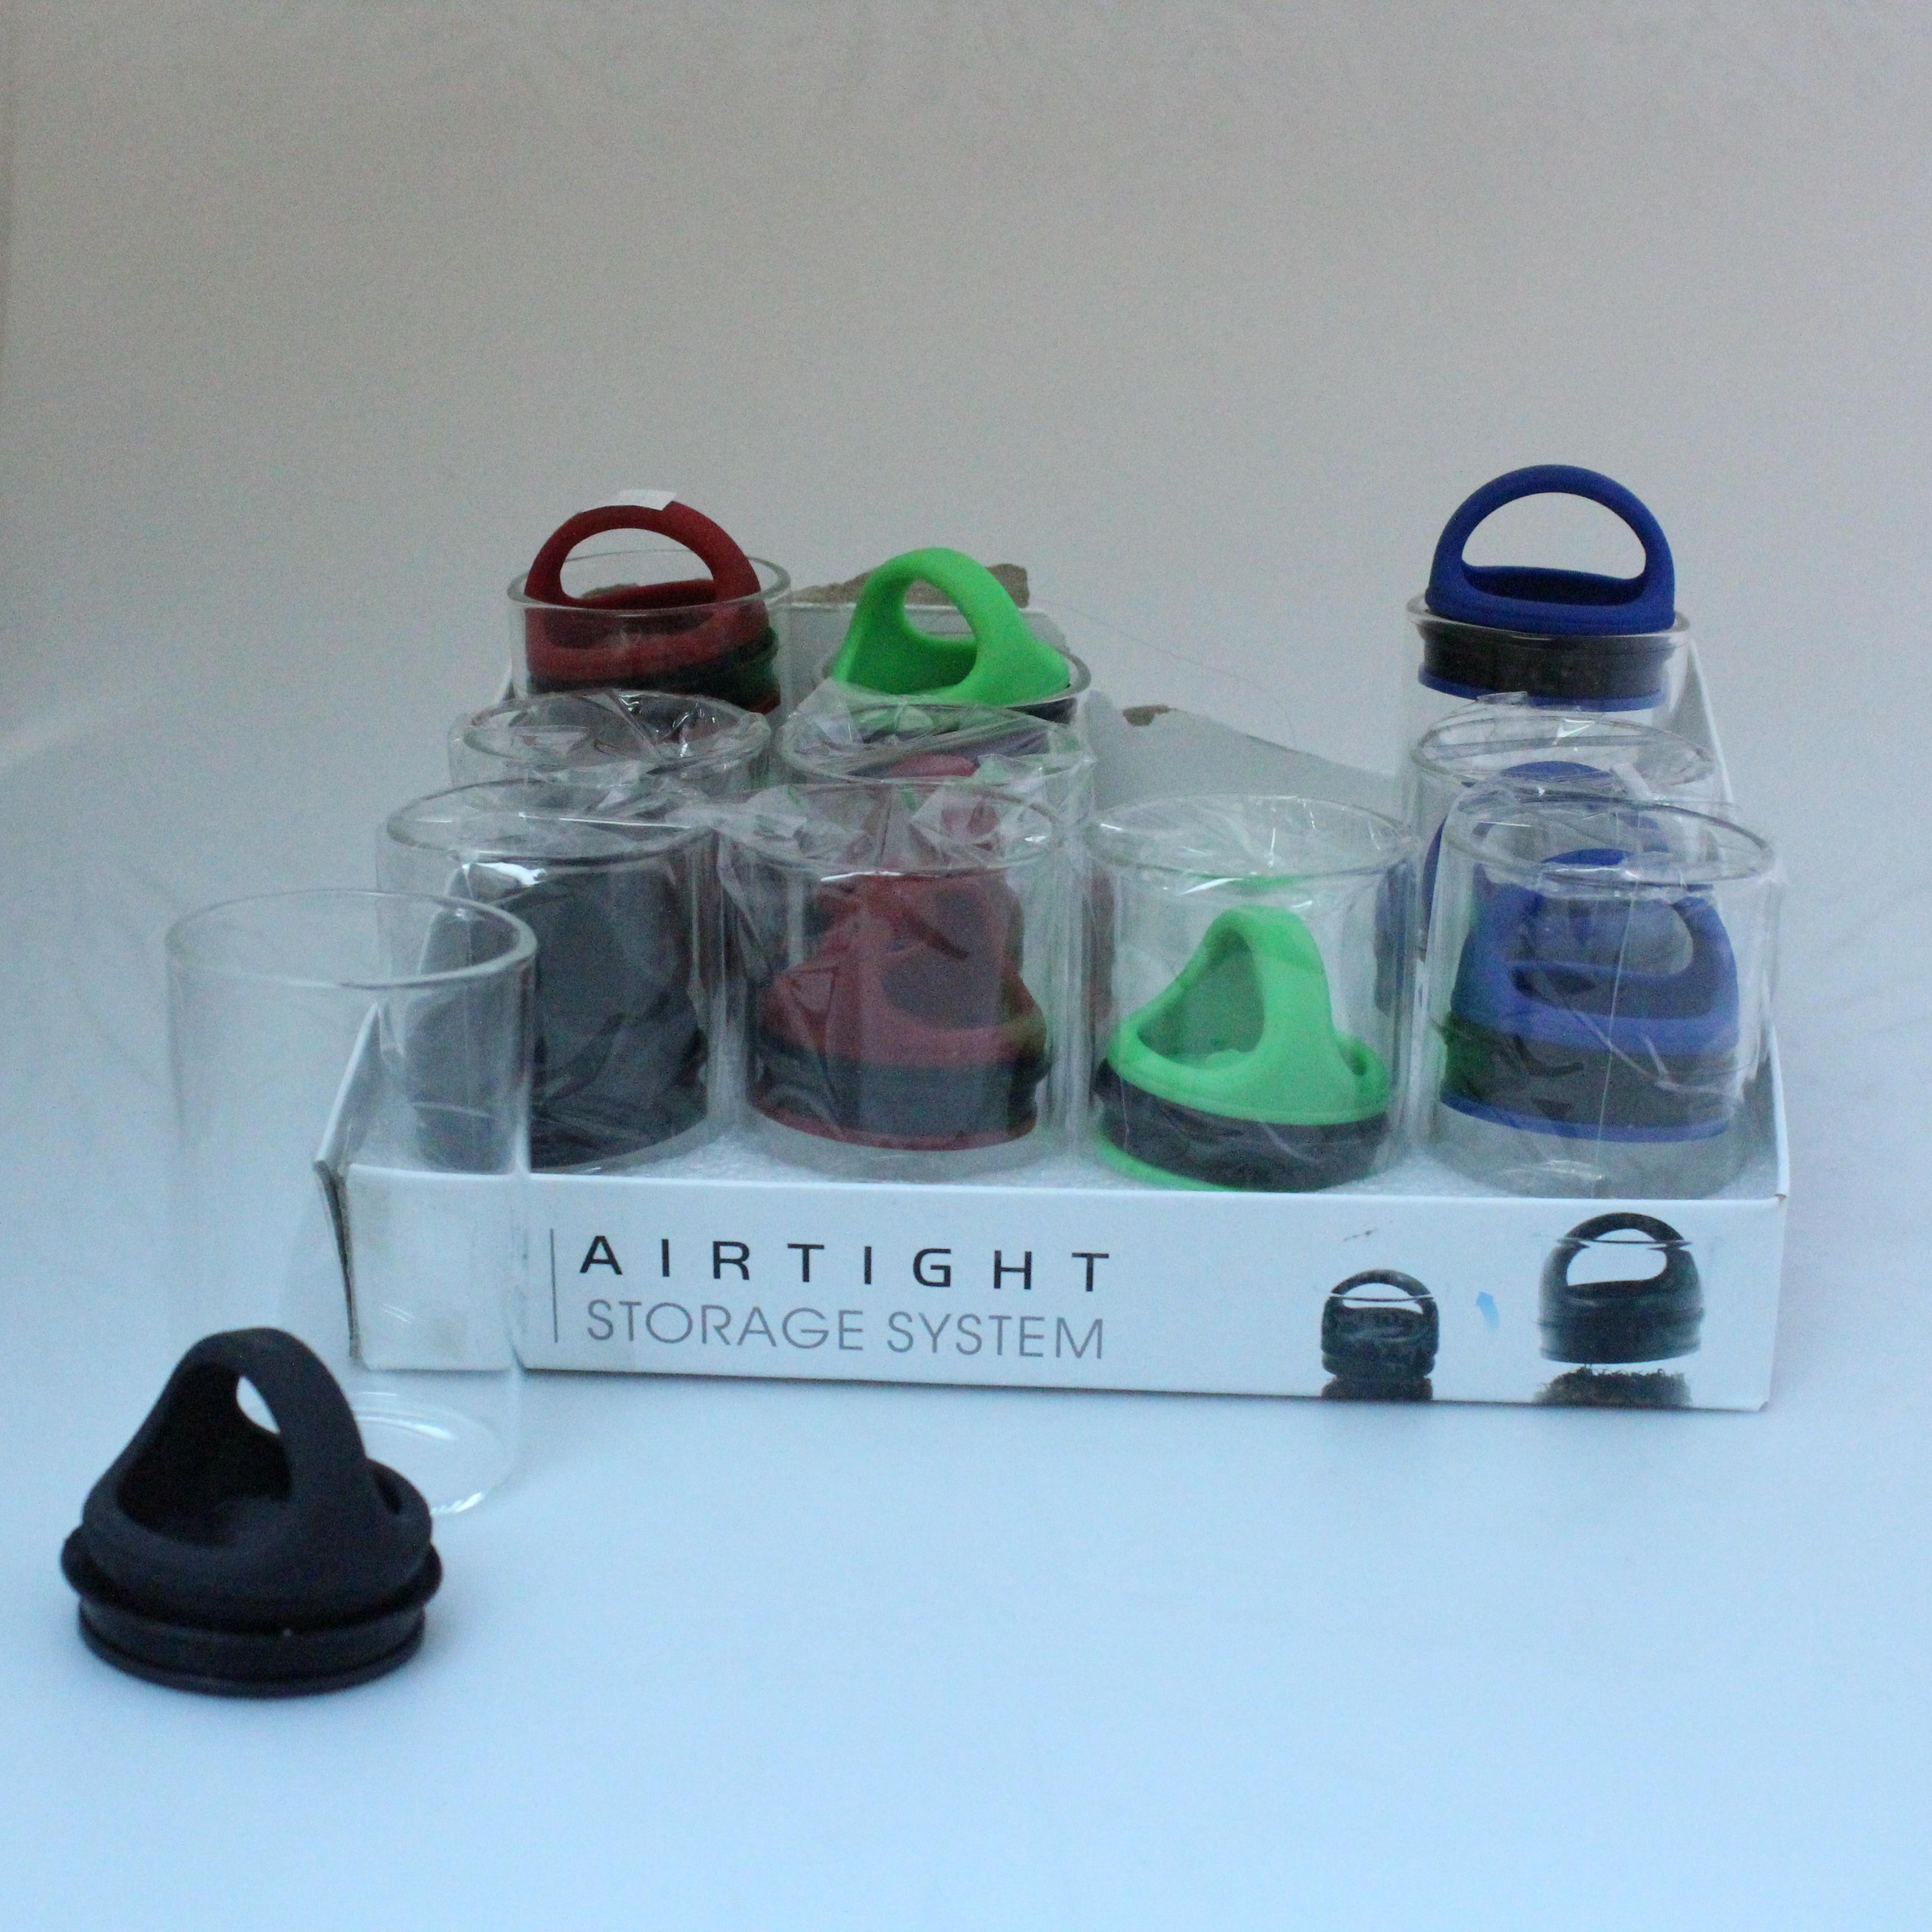 air tight glass jar 12 per pack. Black Bedroom Furniture Sets. Home Design Ideas